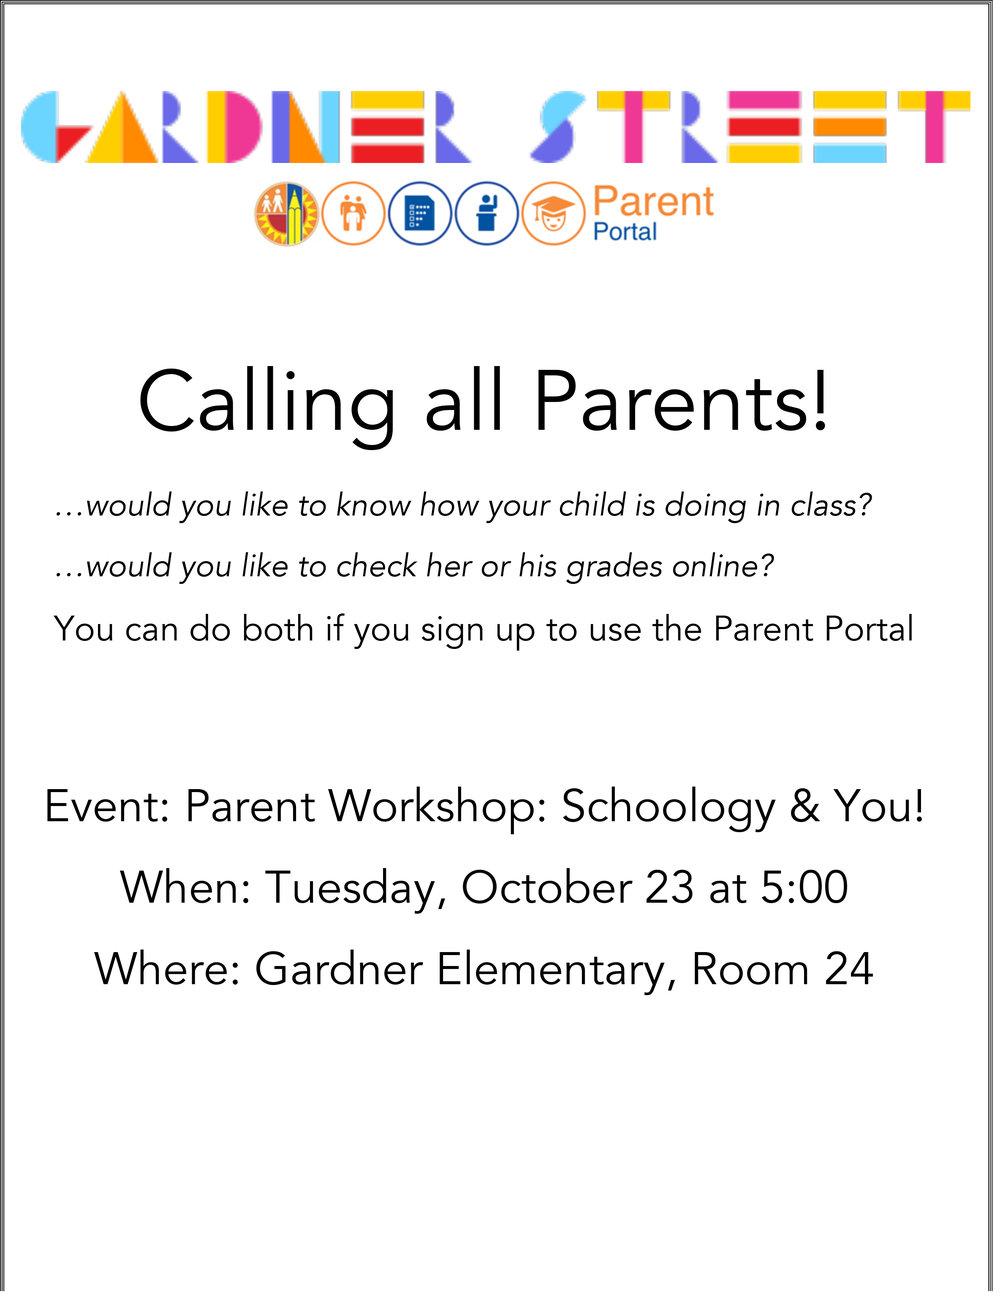 NEW-Parent-Flyer---Schoology-Parent-Workshop.jpg